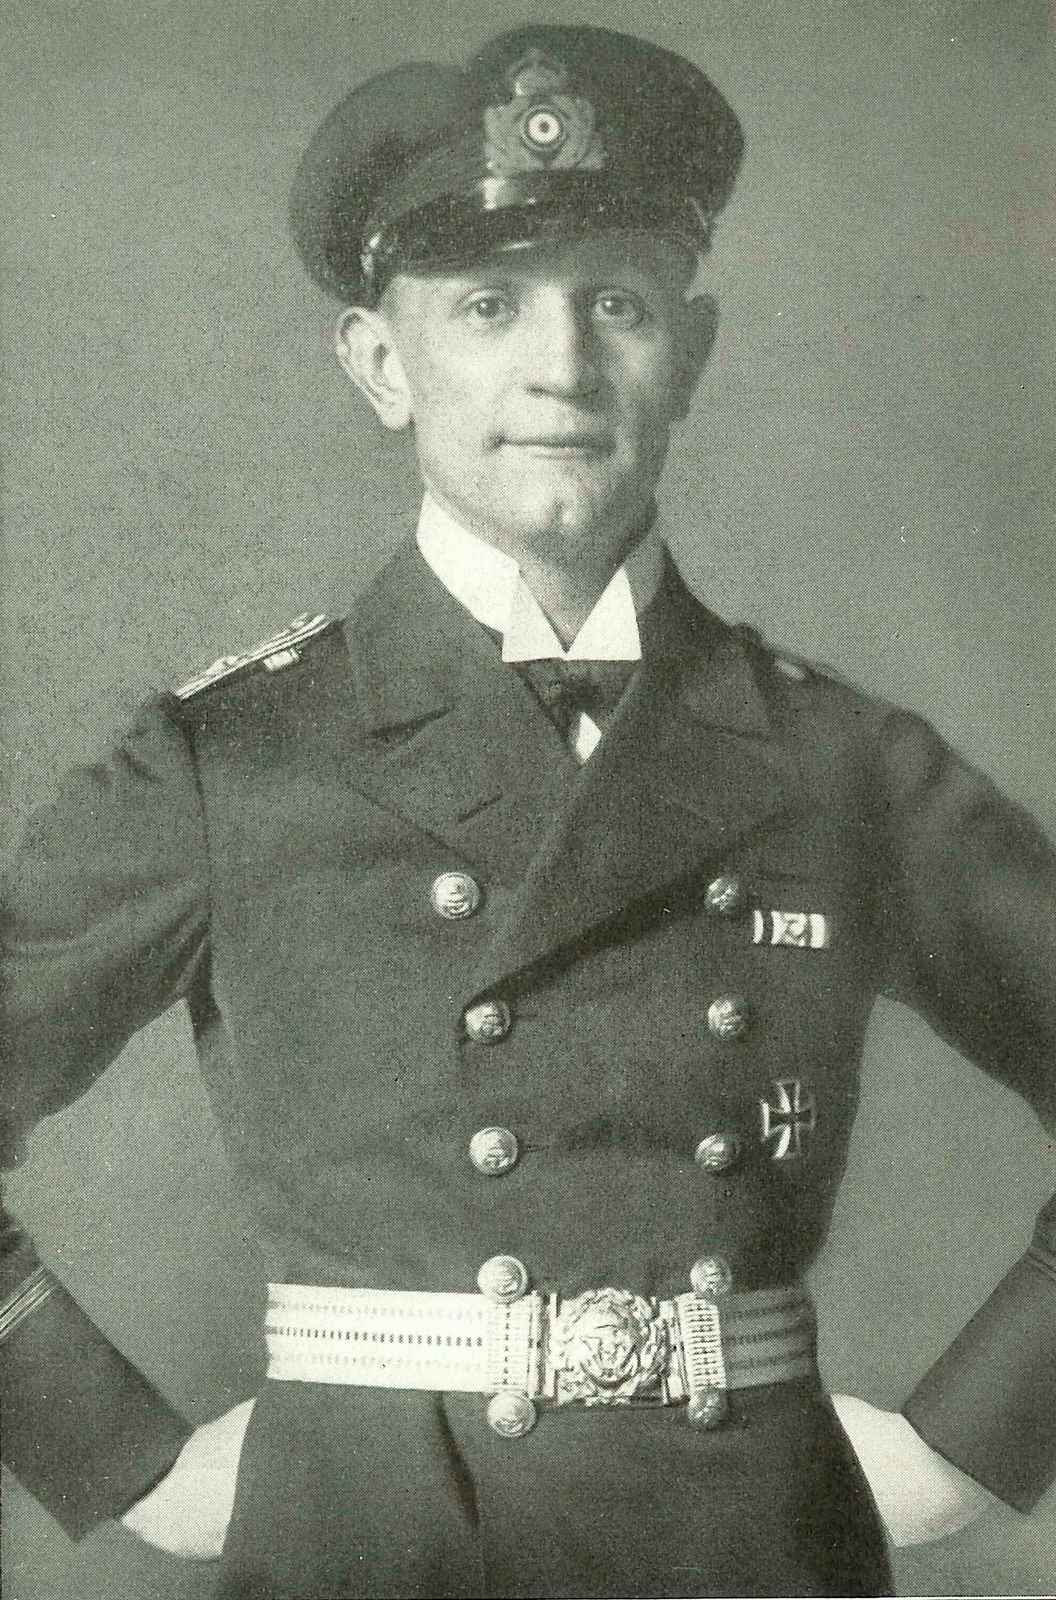 Martin Niemöller: «Όταν ήρθαν να πάρουν τους κομμουνιστές, δε μίλησα γιατί δεν ήμουν κομμουνιστής»